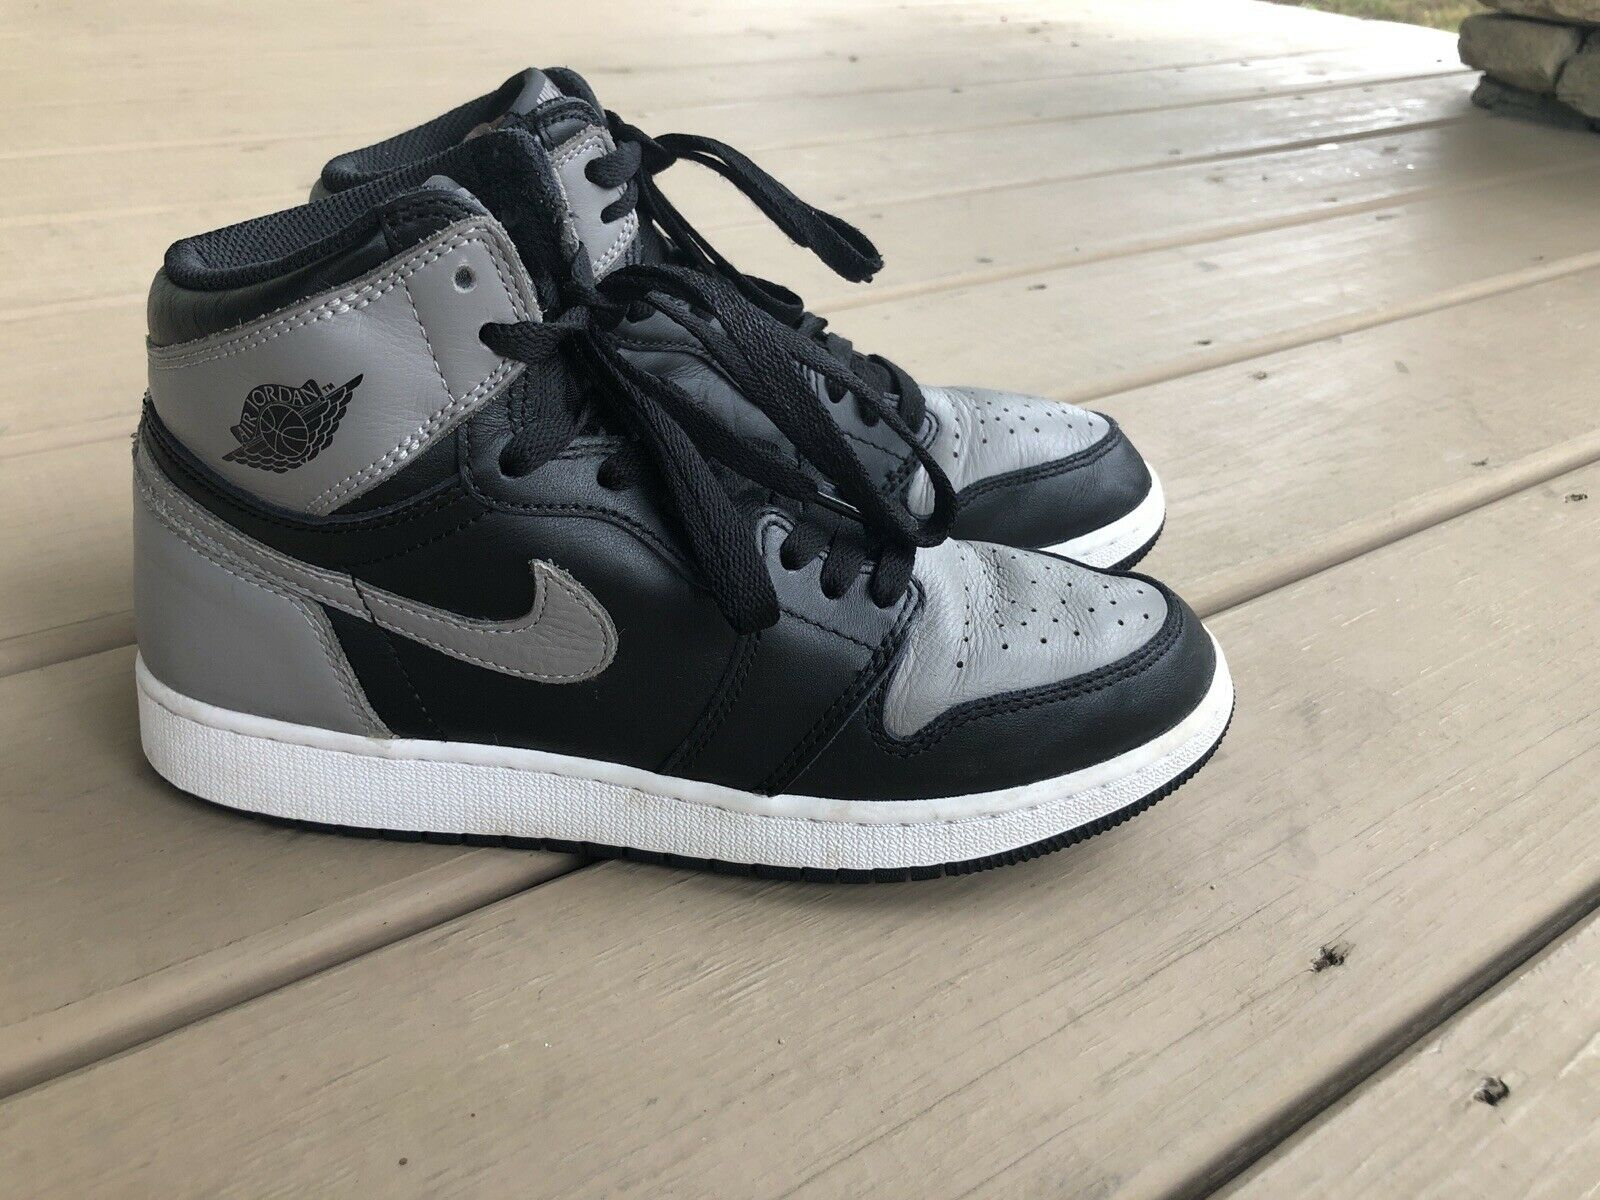 Jordan 1 Retro High Shadow 2018 GS